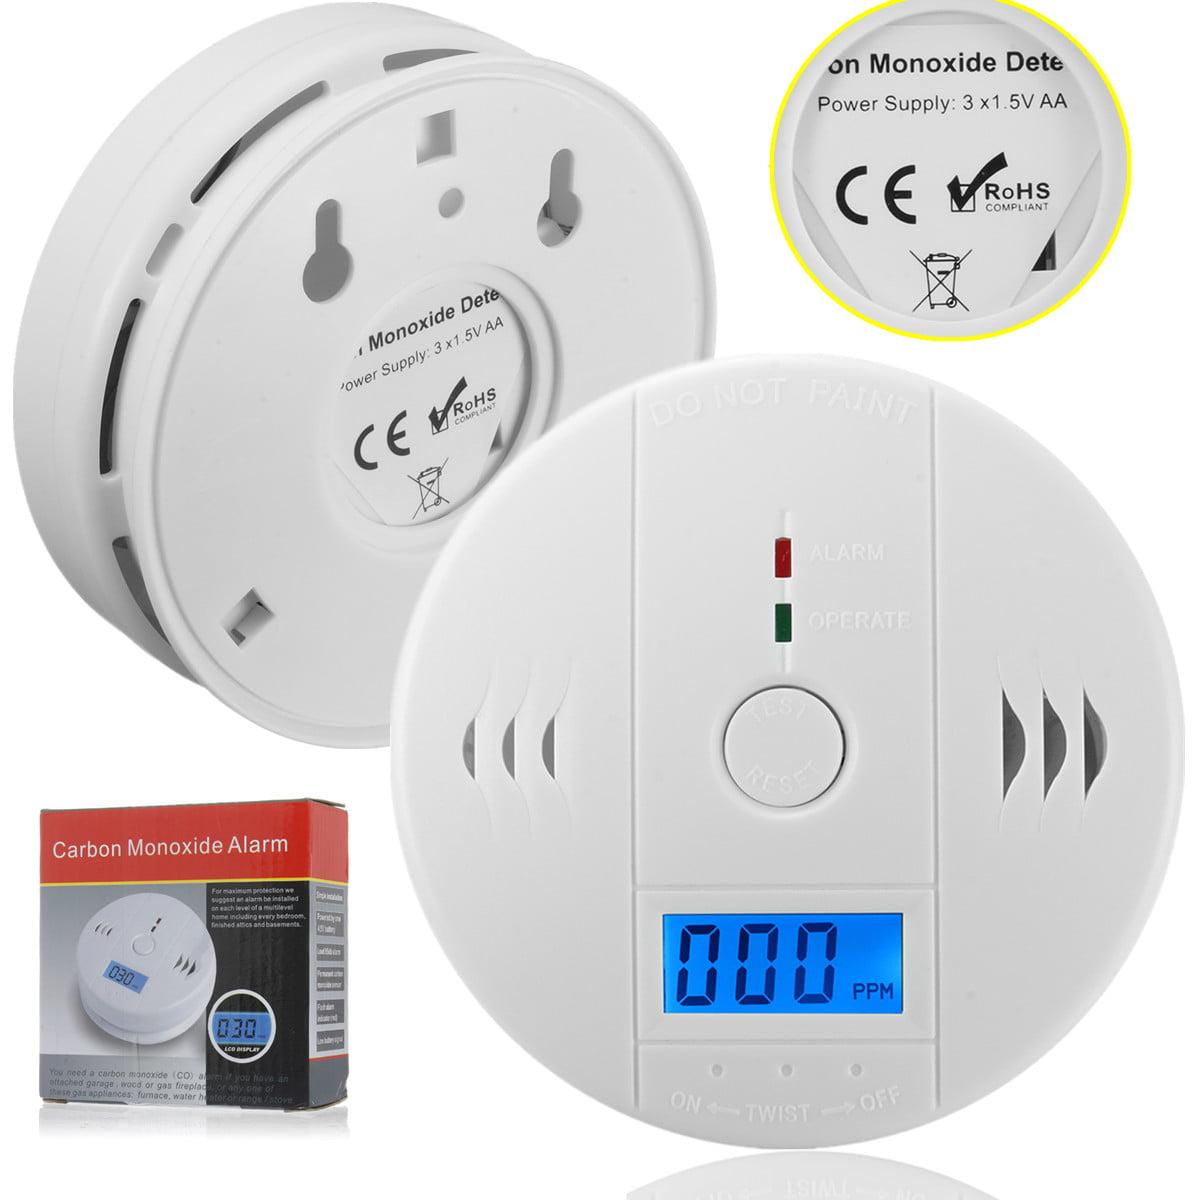 1-50 Pcs Fire CO Carbon Monoxide Poisoning Gas Detecter Digital LCD Display Carbon Monoxide Alarm Sensor Detector Tester Power Detection Equipment Alarm Clock Loud Warning CE RoHS